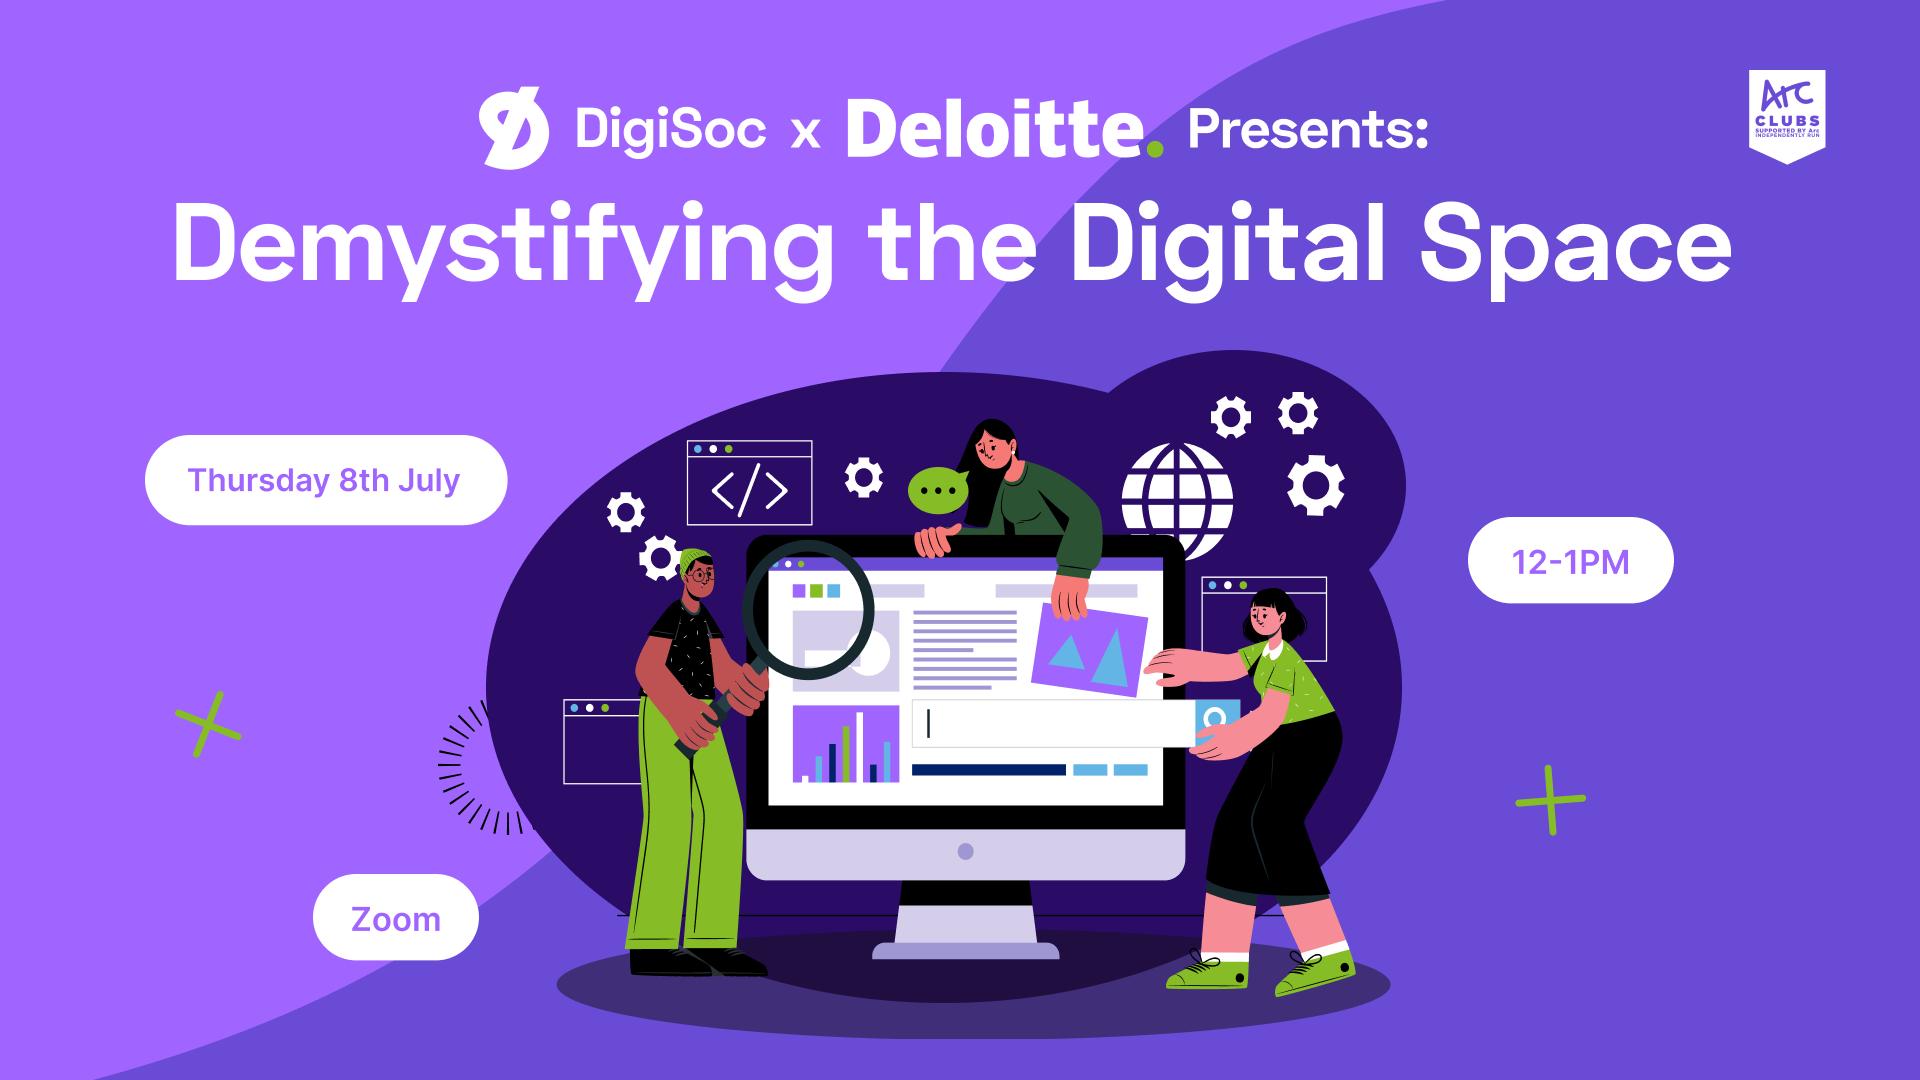 DigiSoc x Deloitte: Demystifying the Digital Space